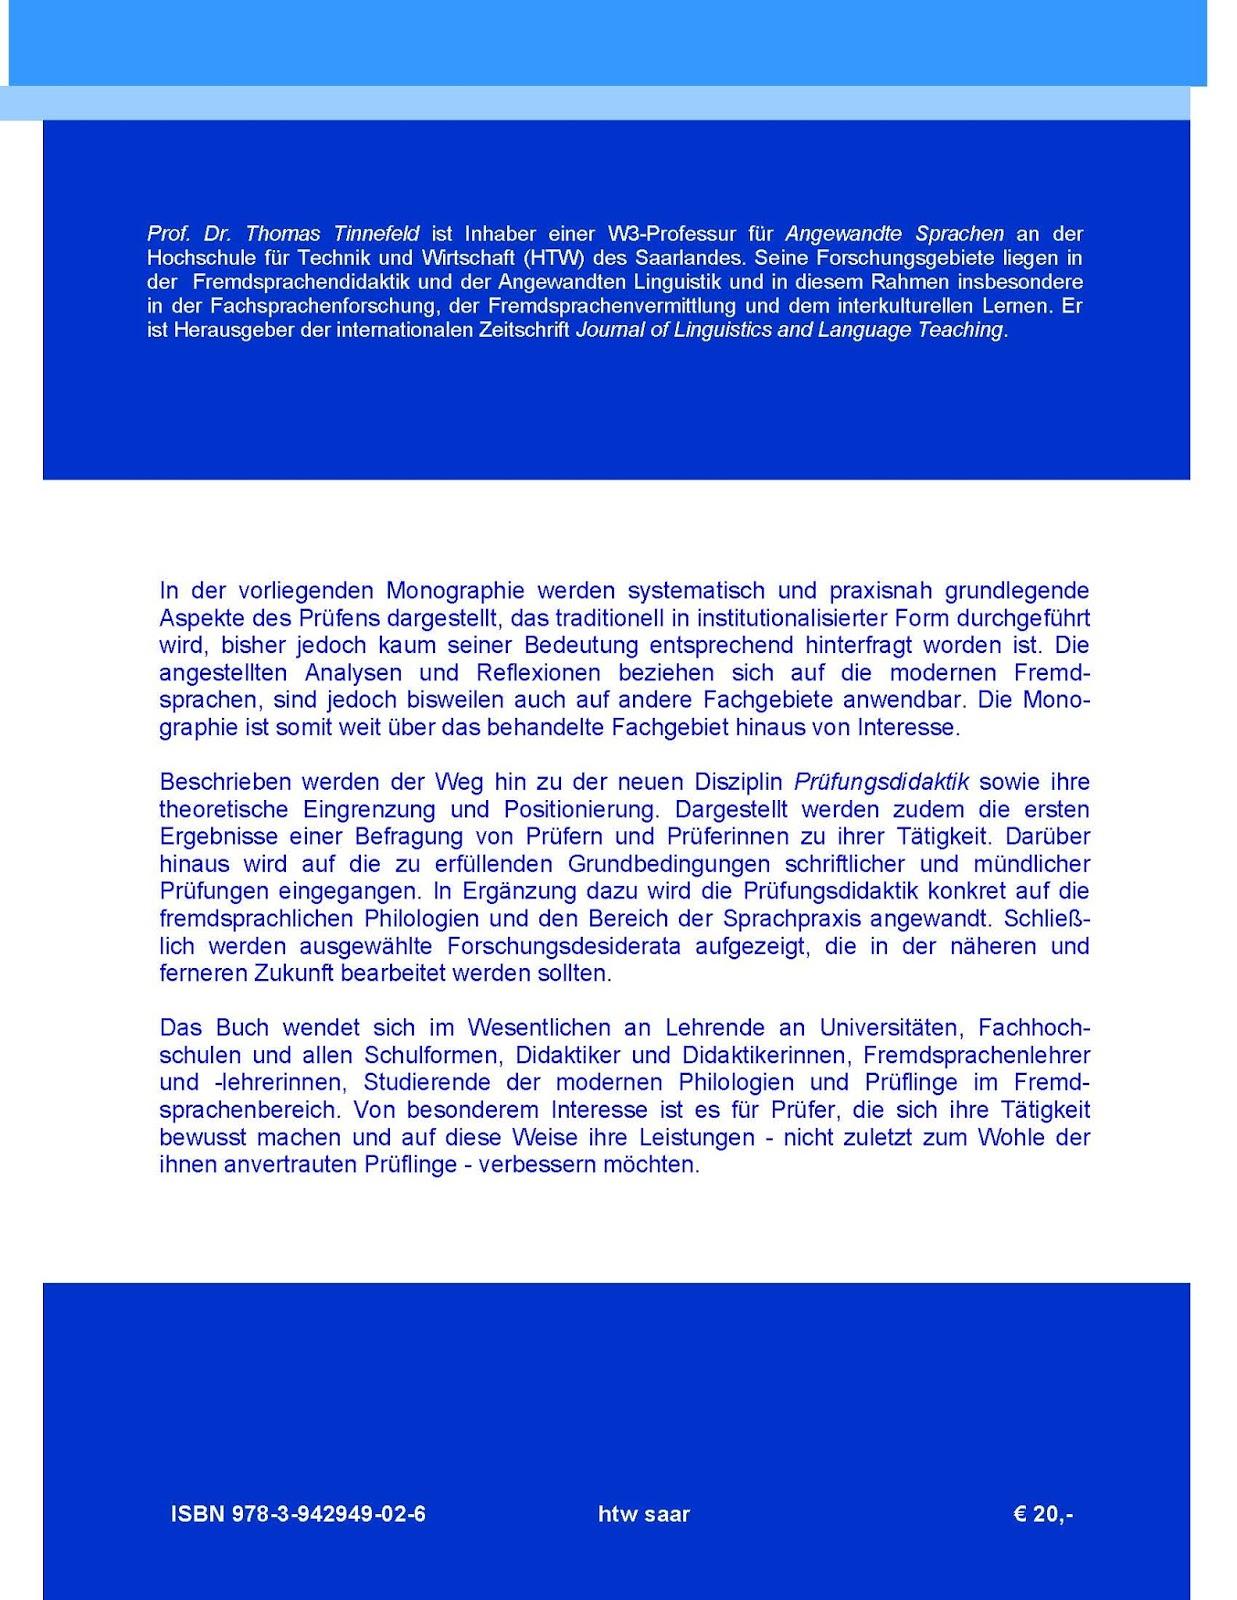 Thomas Tinnefeld: Dimensionen der Prüfungsdidaktik